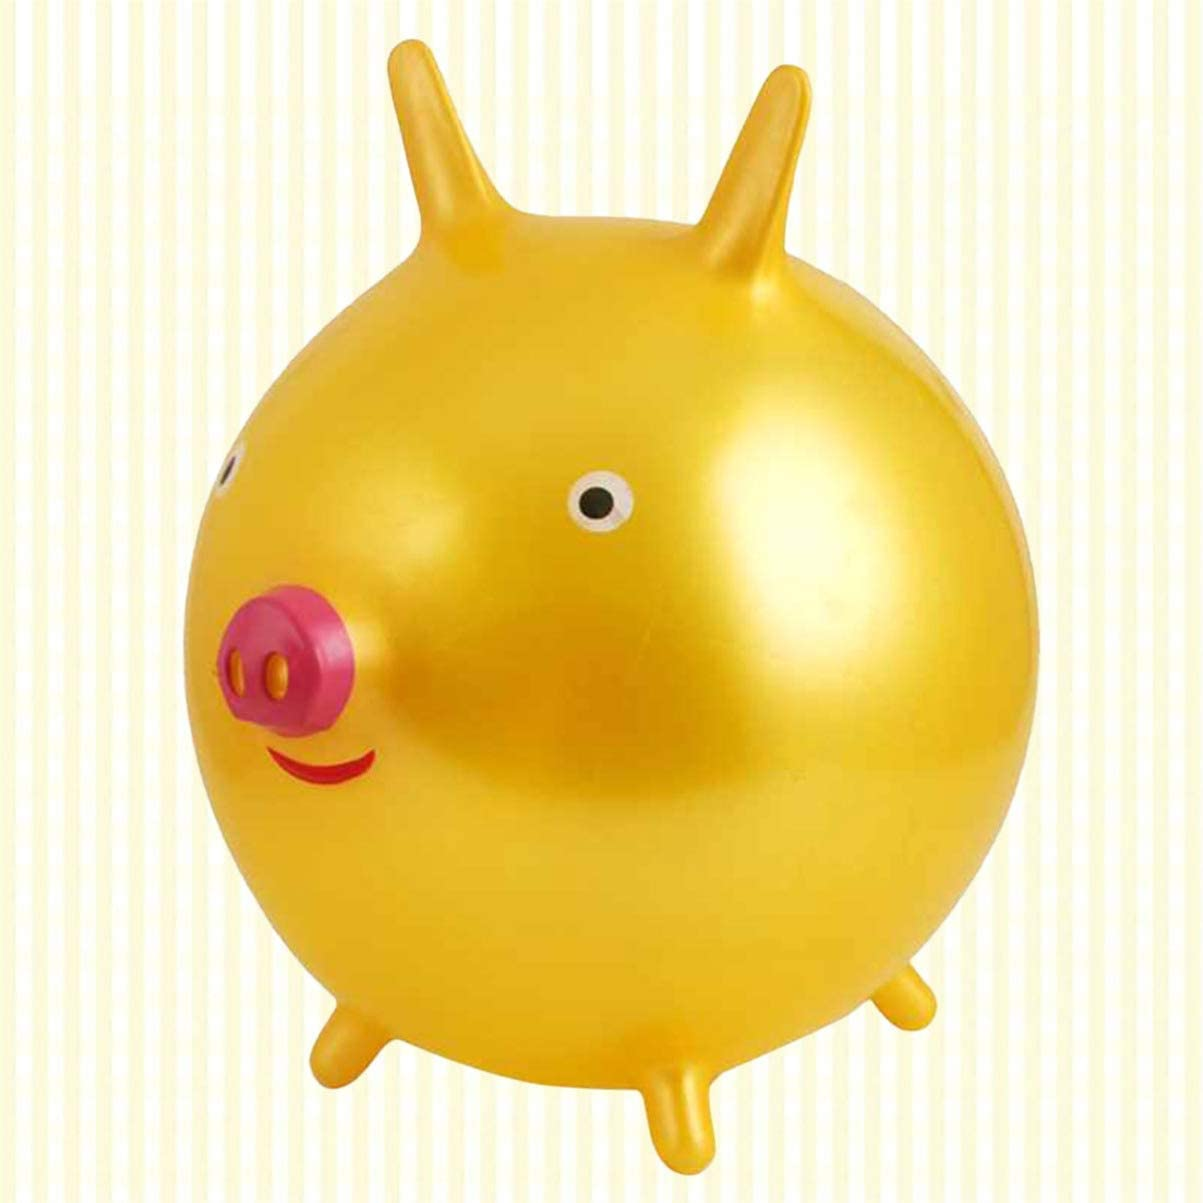 Jsmhh Hopper Ball Piggy Ride On Toys Thicken Ball Kindergarten Play Toys for Kids Peuter (Pink) (Color : Pink) Golden